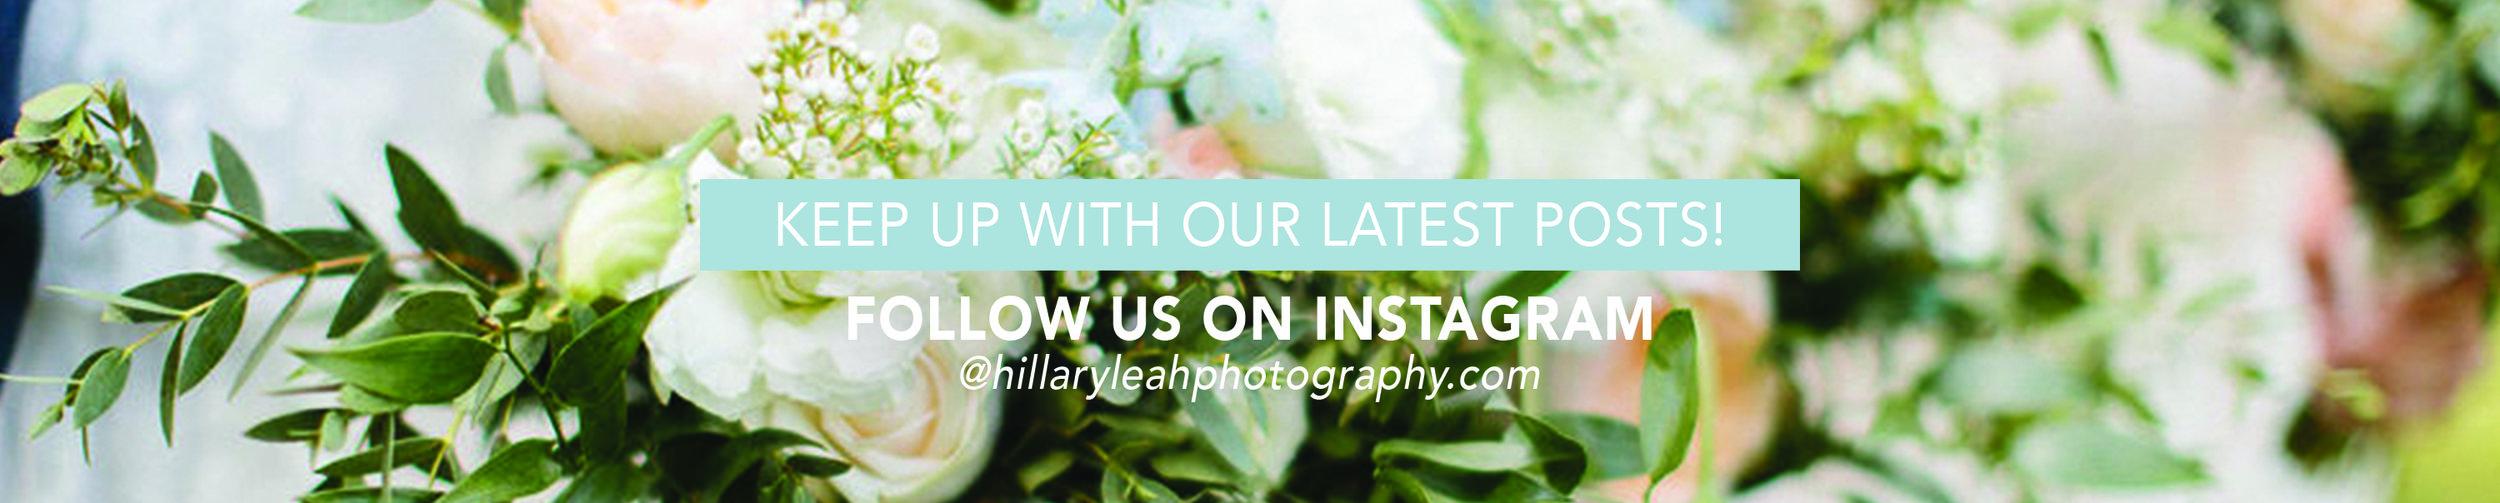 HillaryleahphotographyFollowUs.jpg